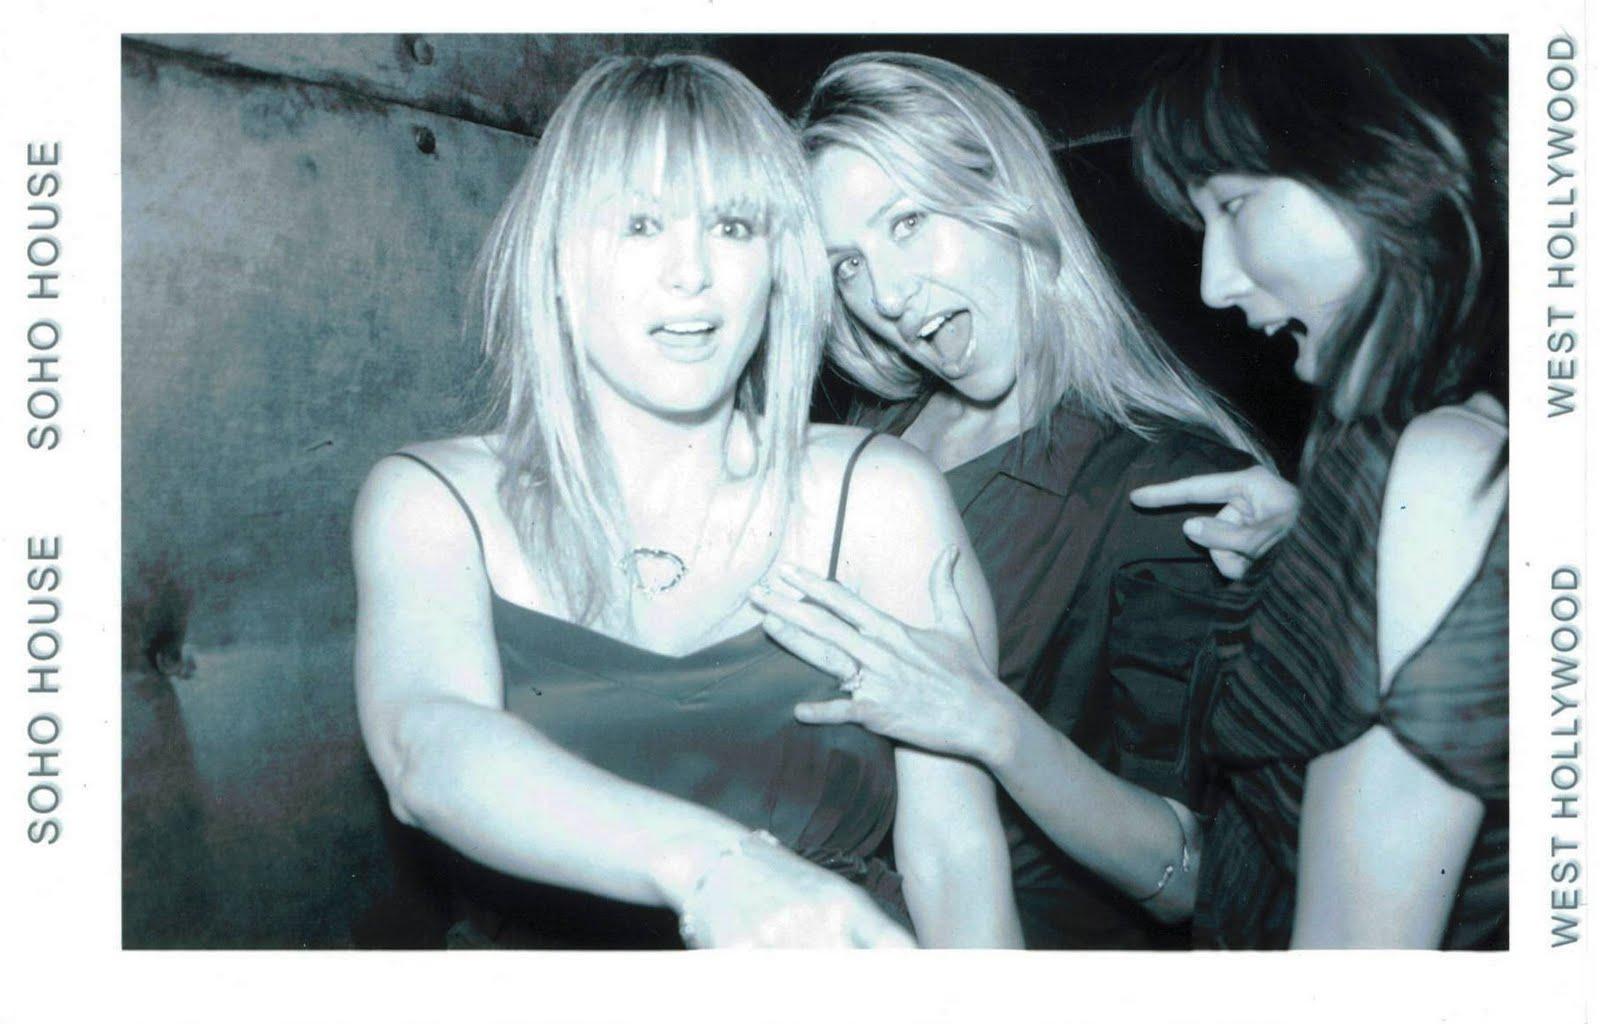 http://3.bp.blogspot.com/_Lg-cAuF6v14/TGSVtOwIGHI/AAAAAAAADsw/hW7N7epQPYA/s1600/10-07-28+Soho+w+Poppie+Amy.jpg